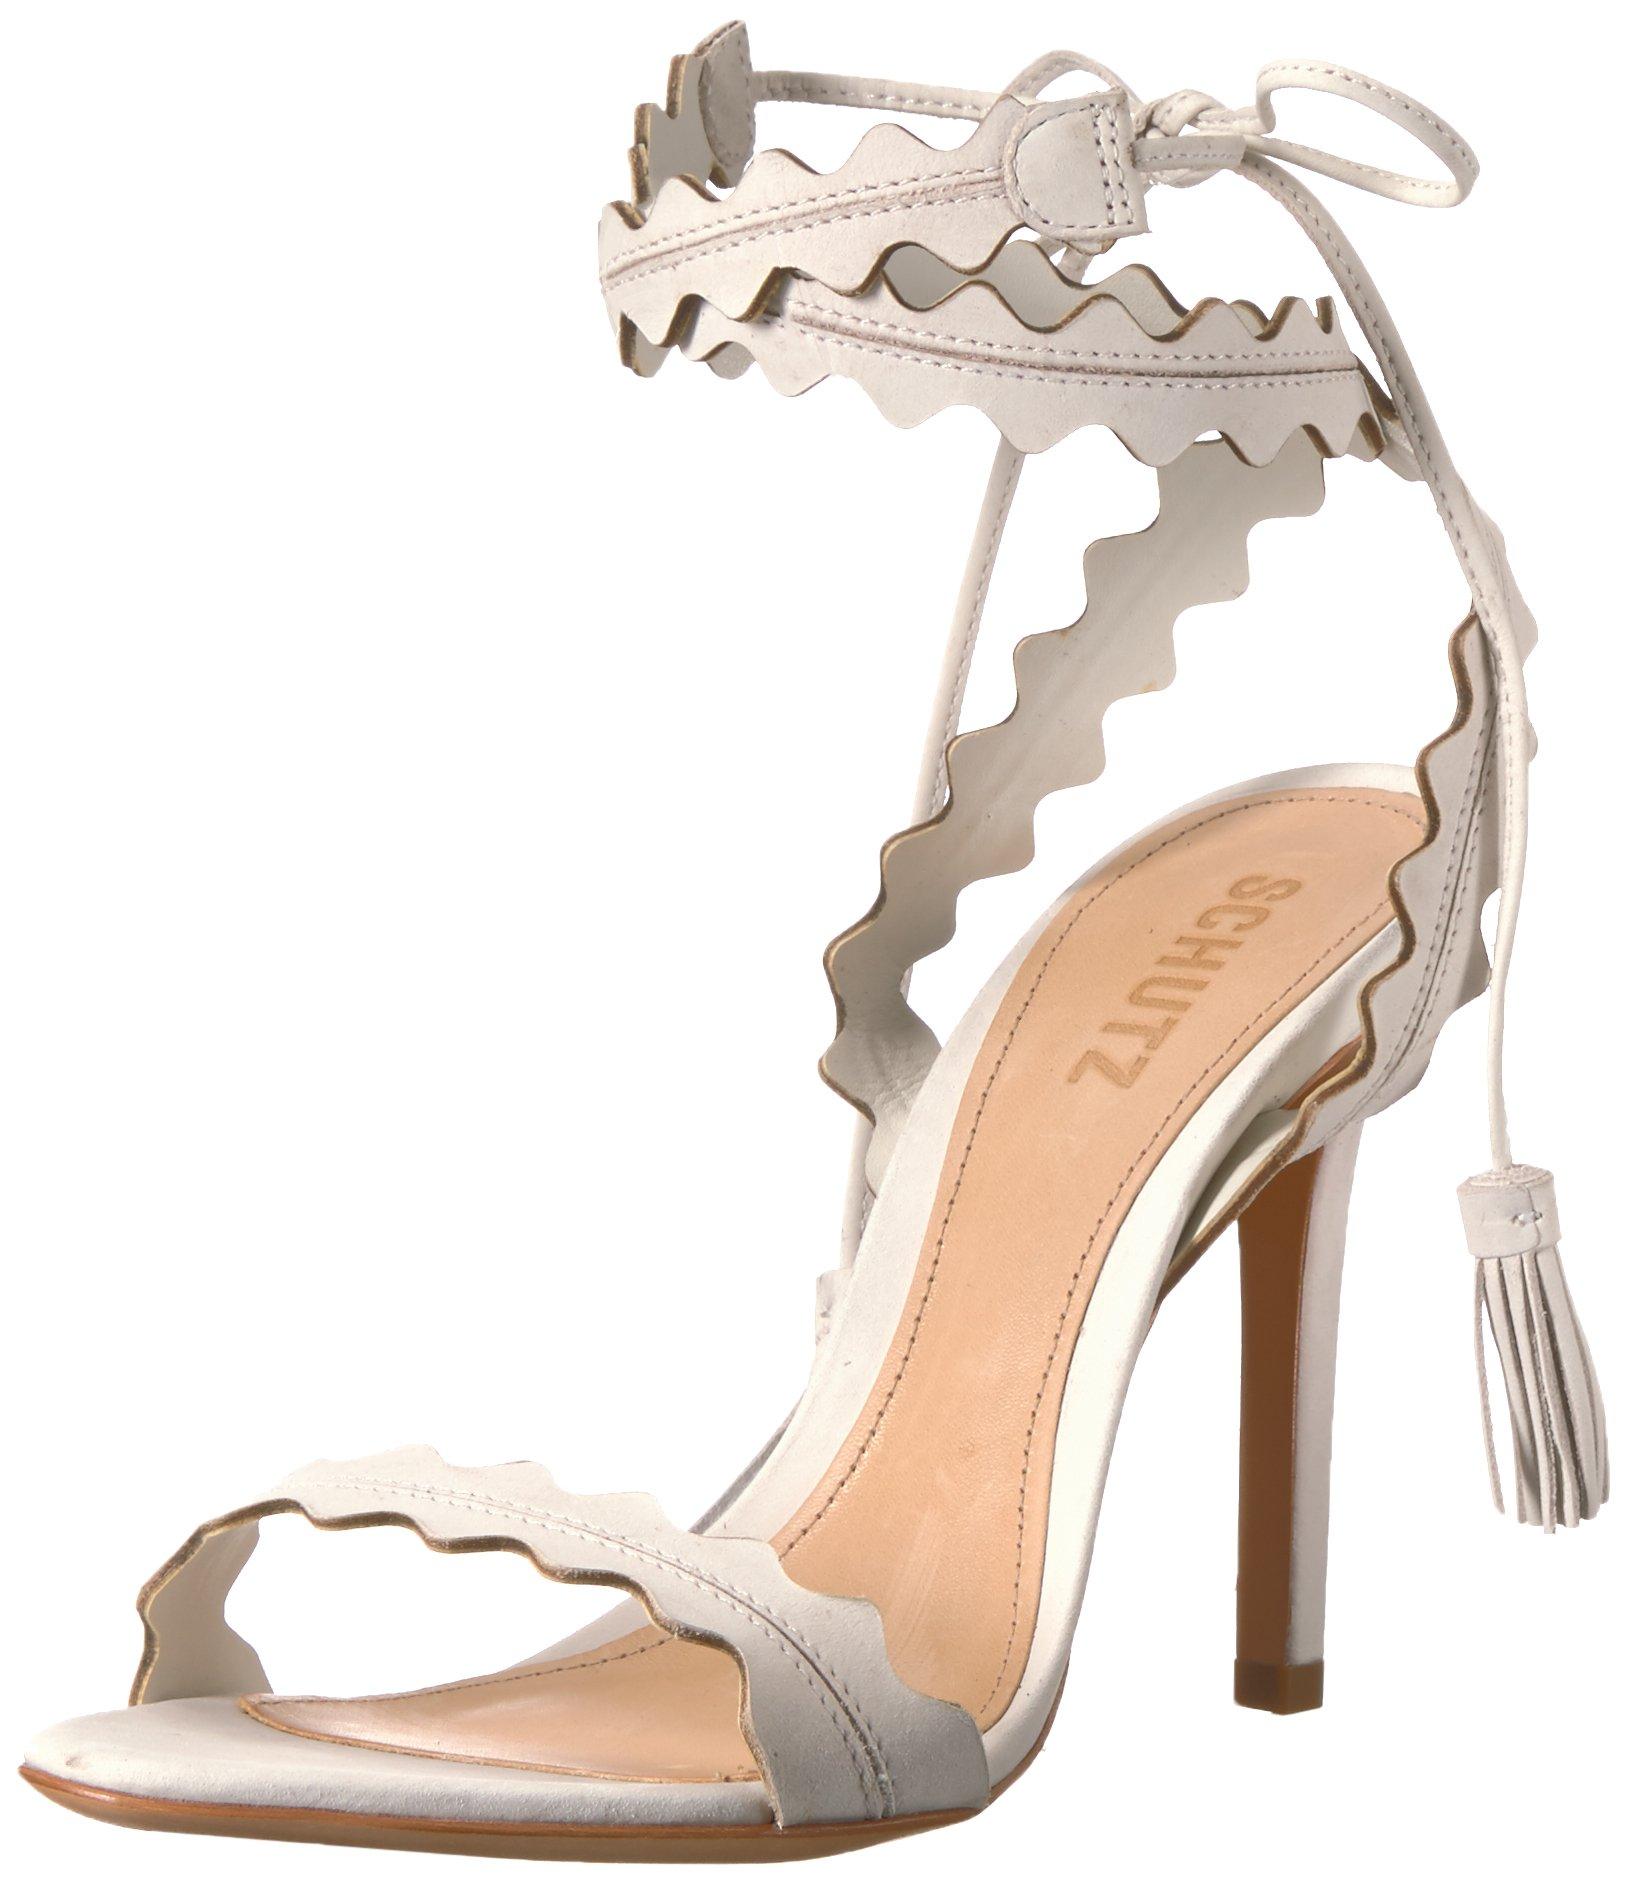 Schutz Women's Lisana Heeled Sandal, Light Beige, 6.5 M US